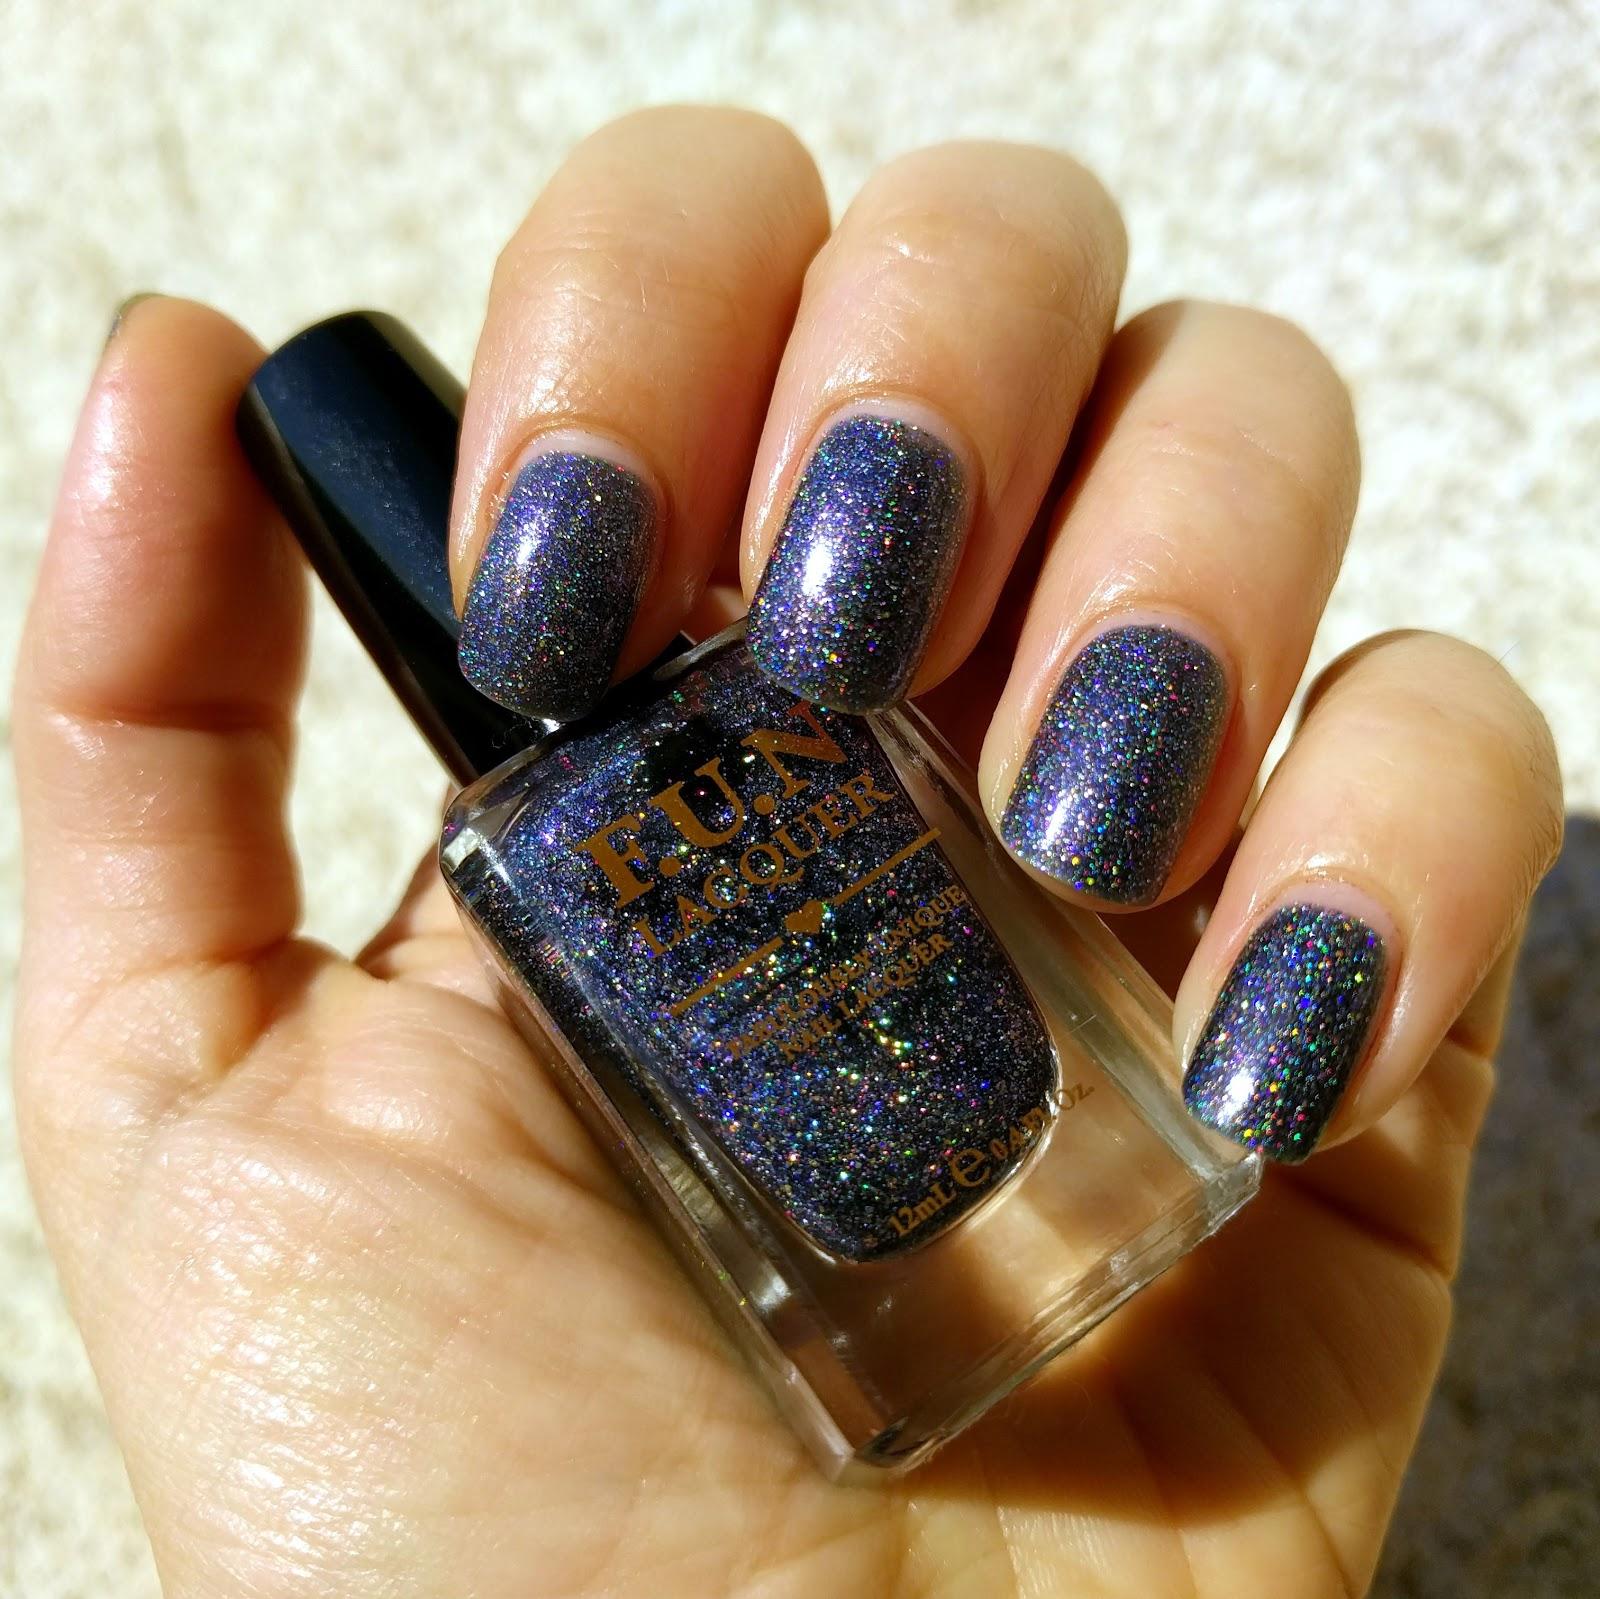 old: shine eye\'s shiny nails: fun lacquer fashion show (new year 2016)